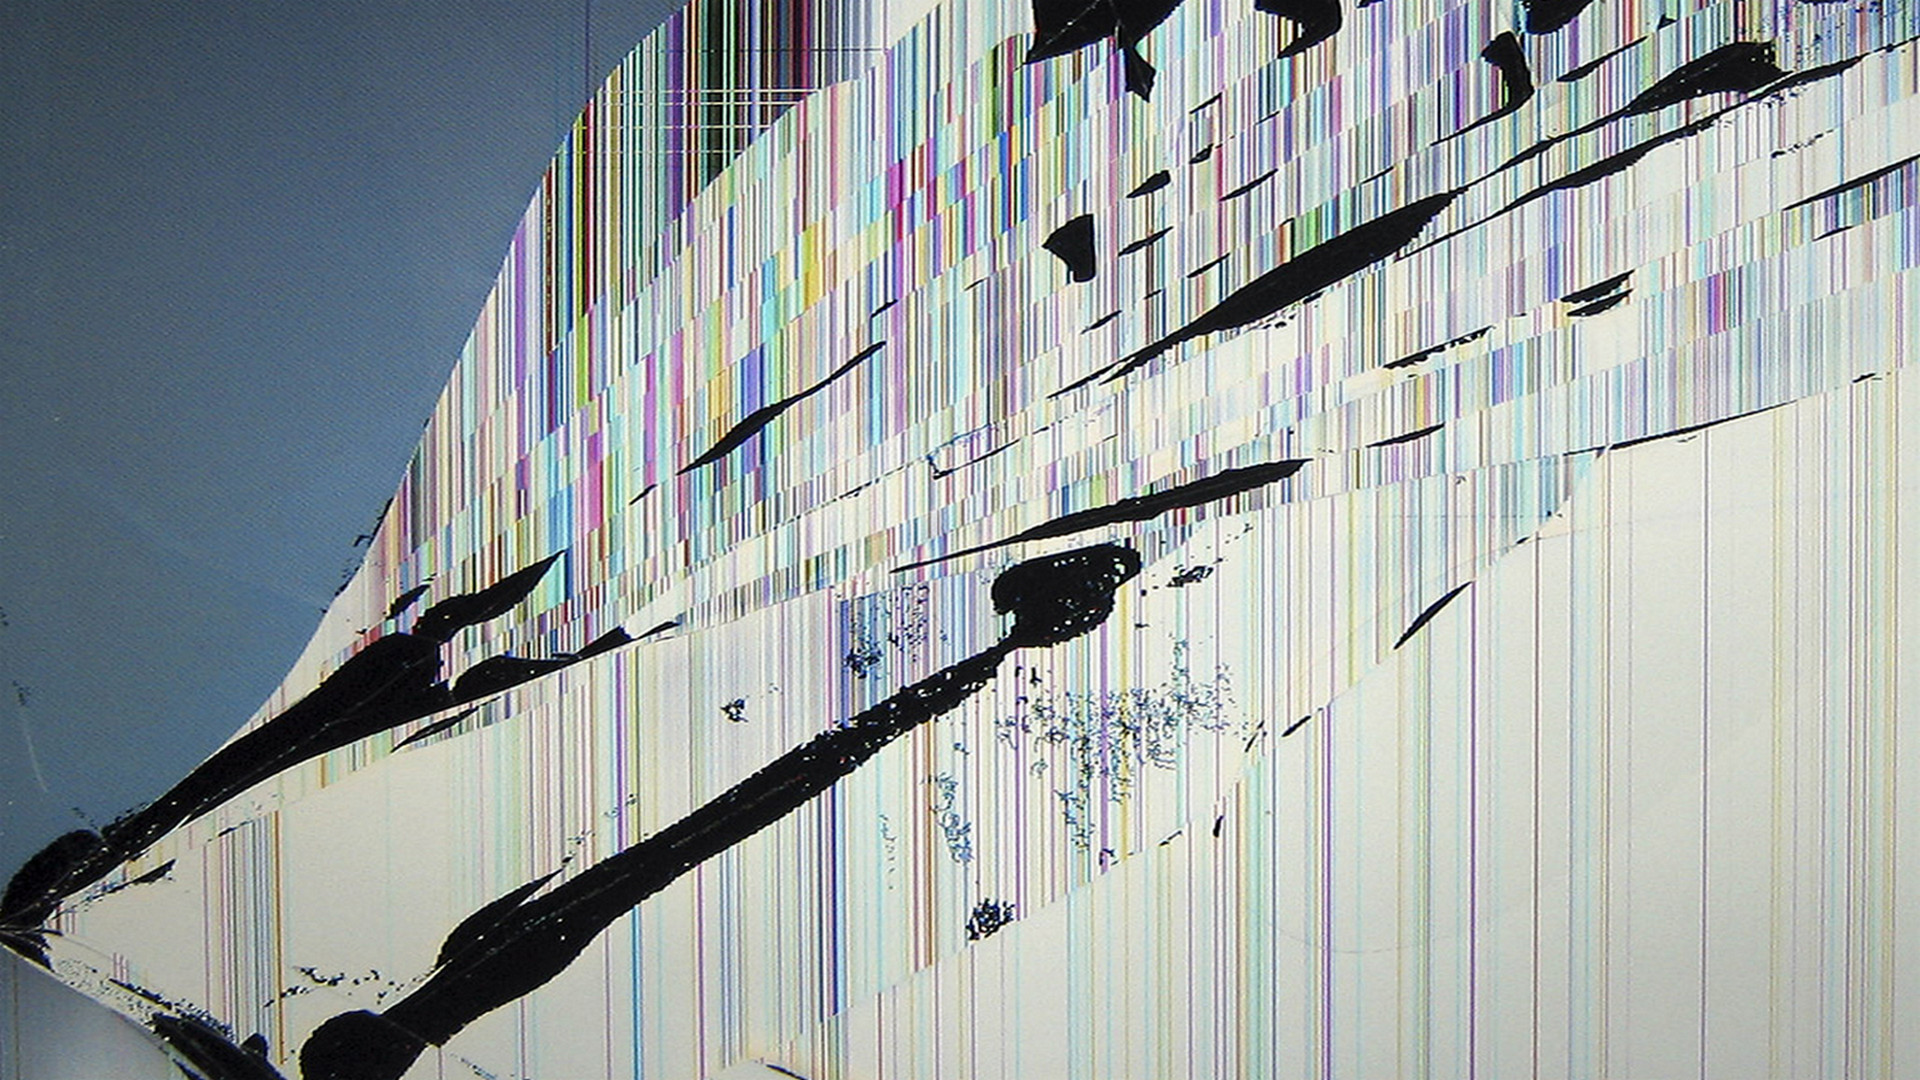 cracked phone screen wallpaper download